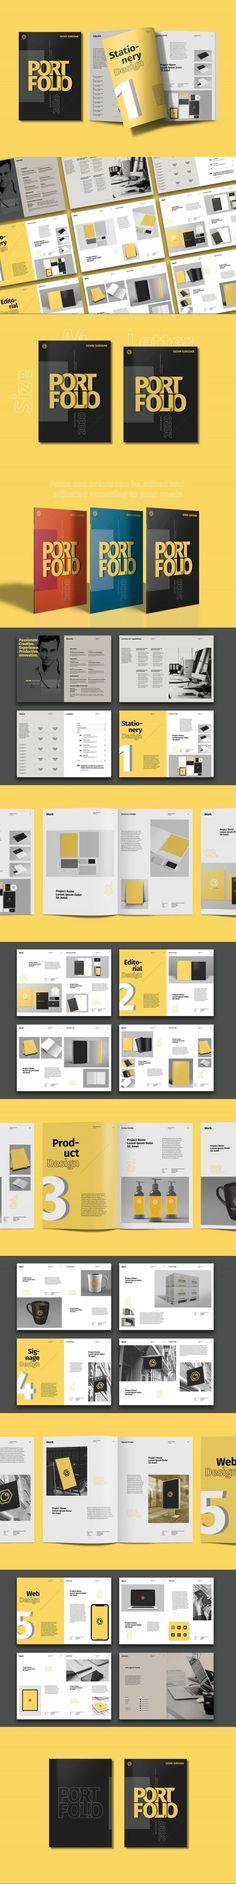 Oedin Personal Portfolio #BrochureTemplate #DesignPortfolio #clothing #businesstrifold #3fold #simple #bold #brochures #PortfolioBrochure #PortfolioTemplates #BrochureTemplates #portfolio #brochure #portfoliodesign #simple #models #punk #BrochureTemplates #portfolio Personal Portfolio, Brochure Template, Portfolio Design, Templates, Brochures, Punk, Models, Simple, Clothing